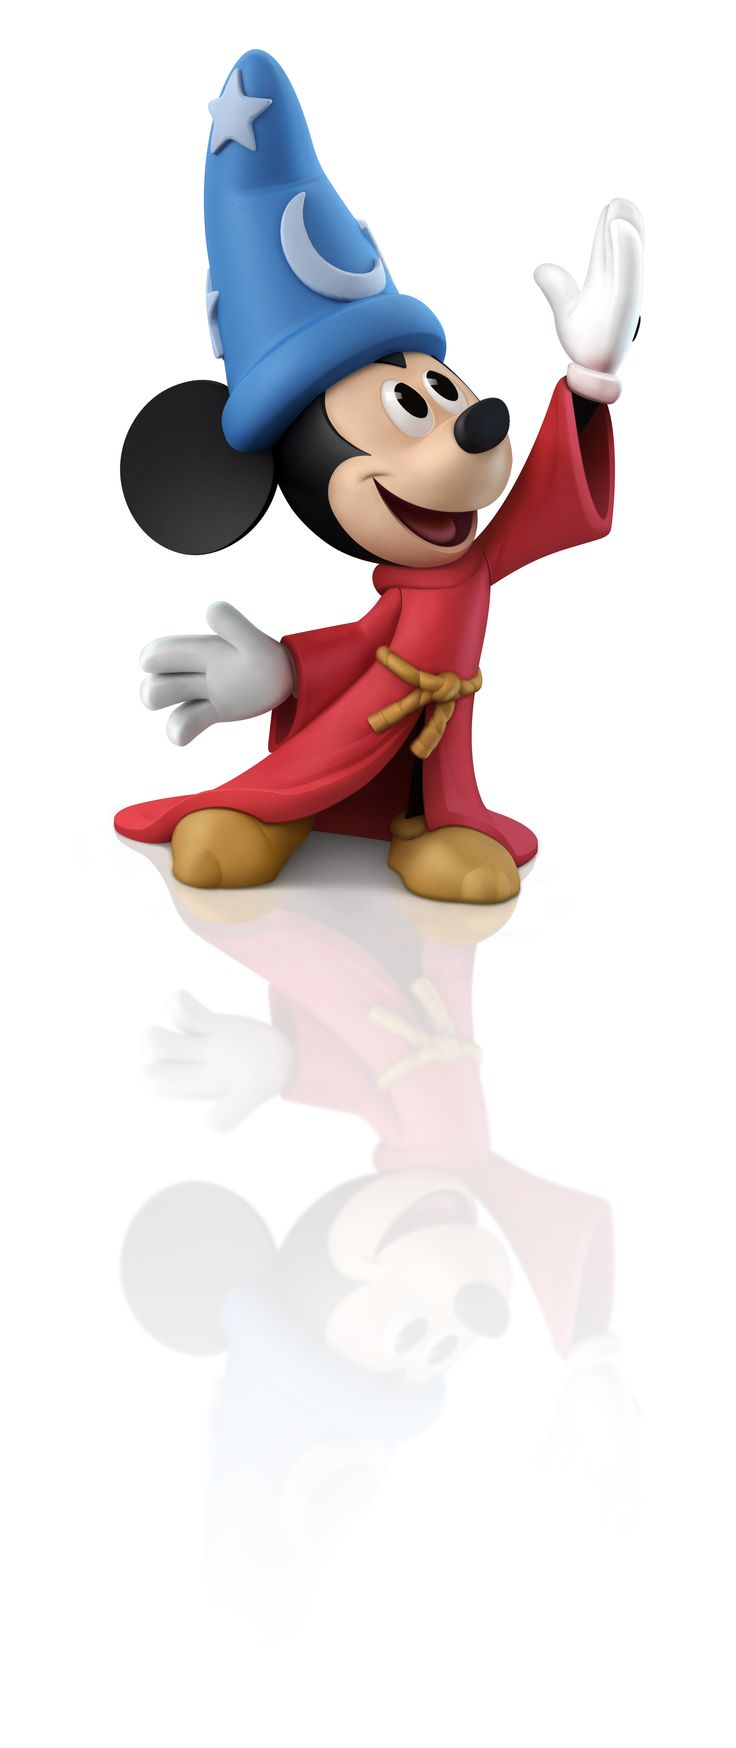 Disney Character Design Apprentice : Best disney boy characters images on pinterest